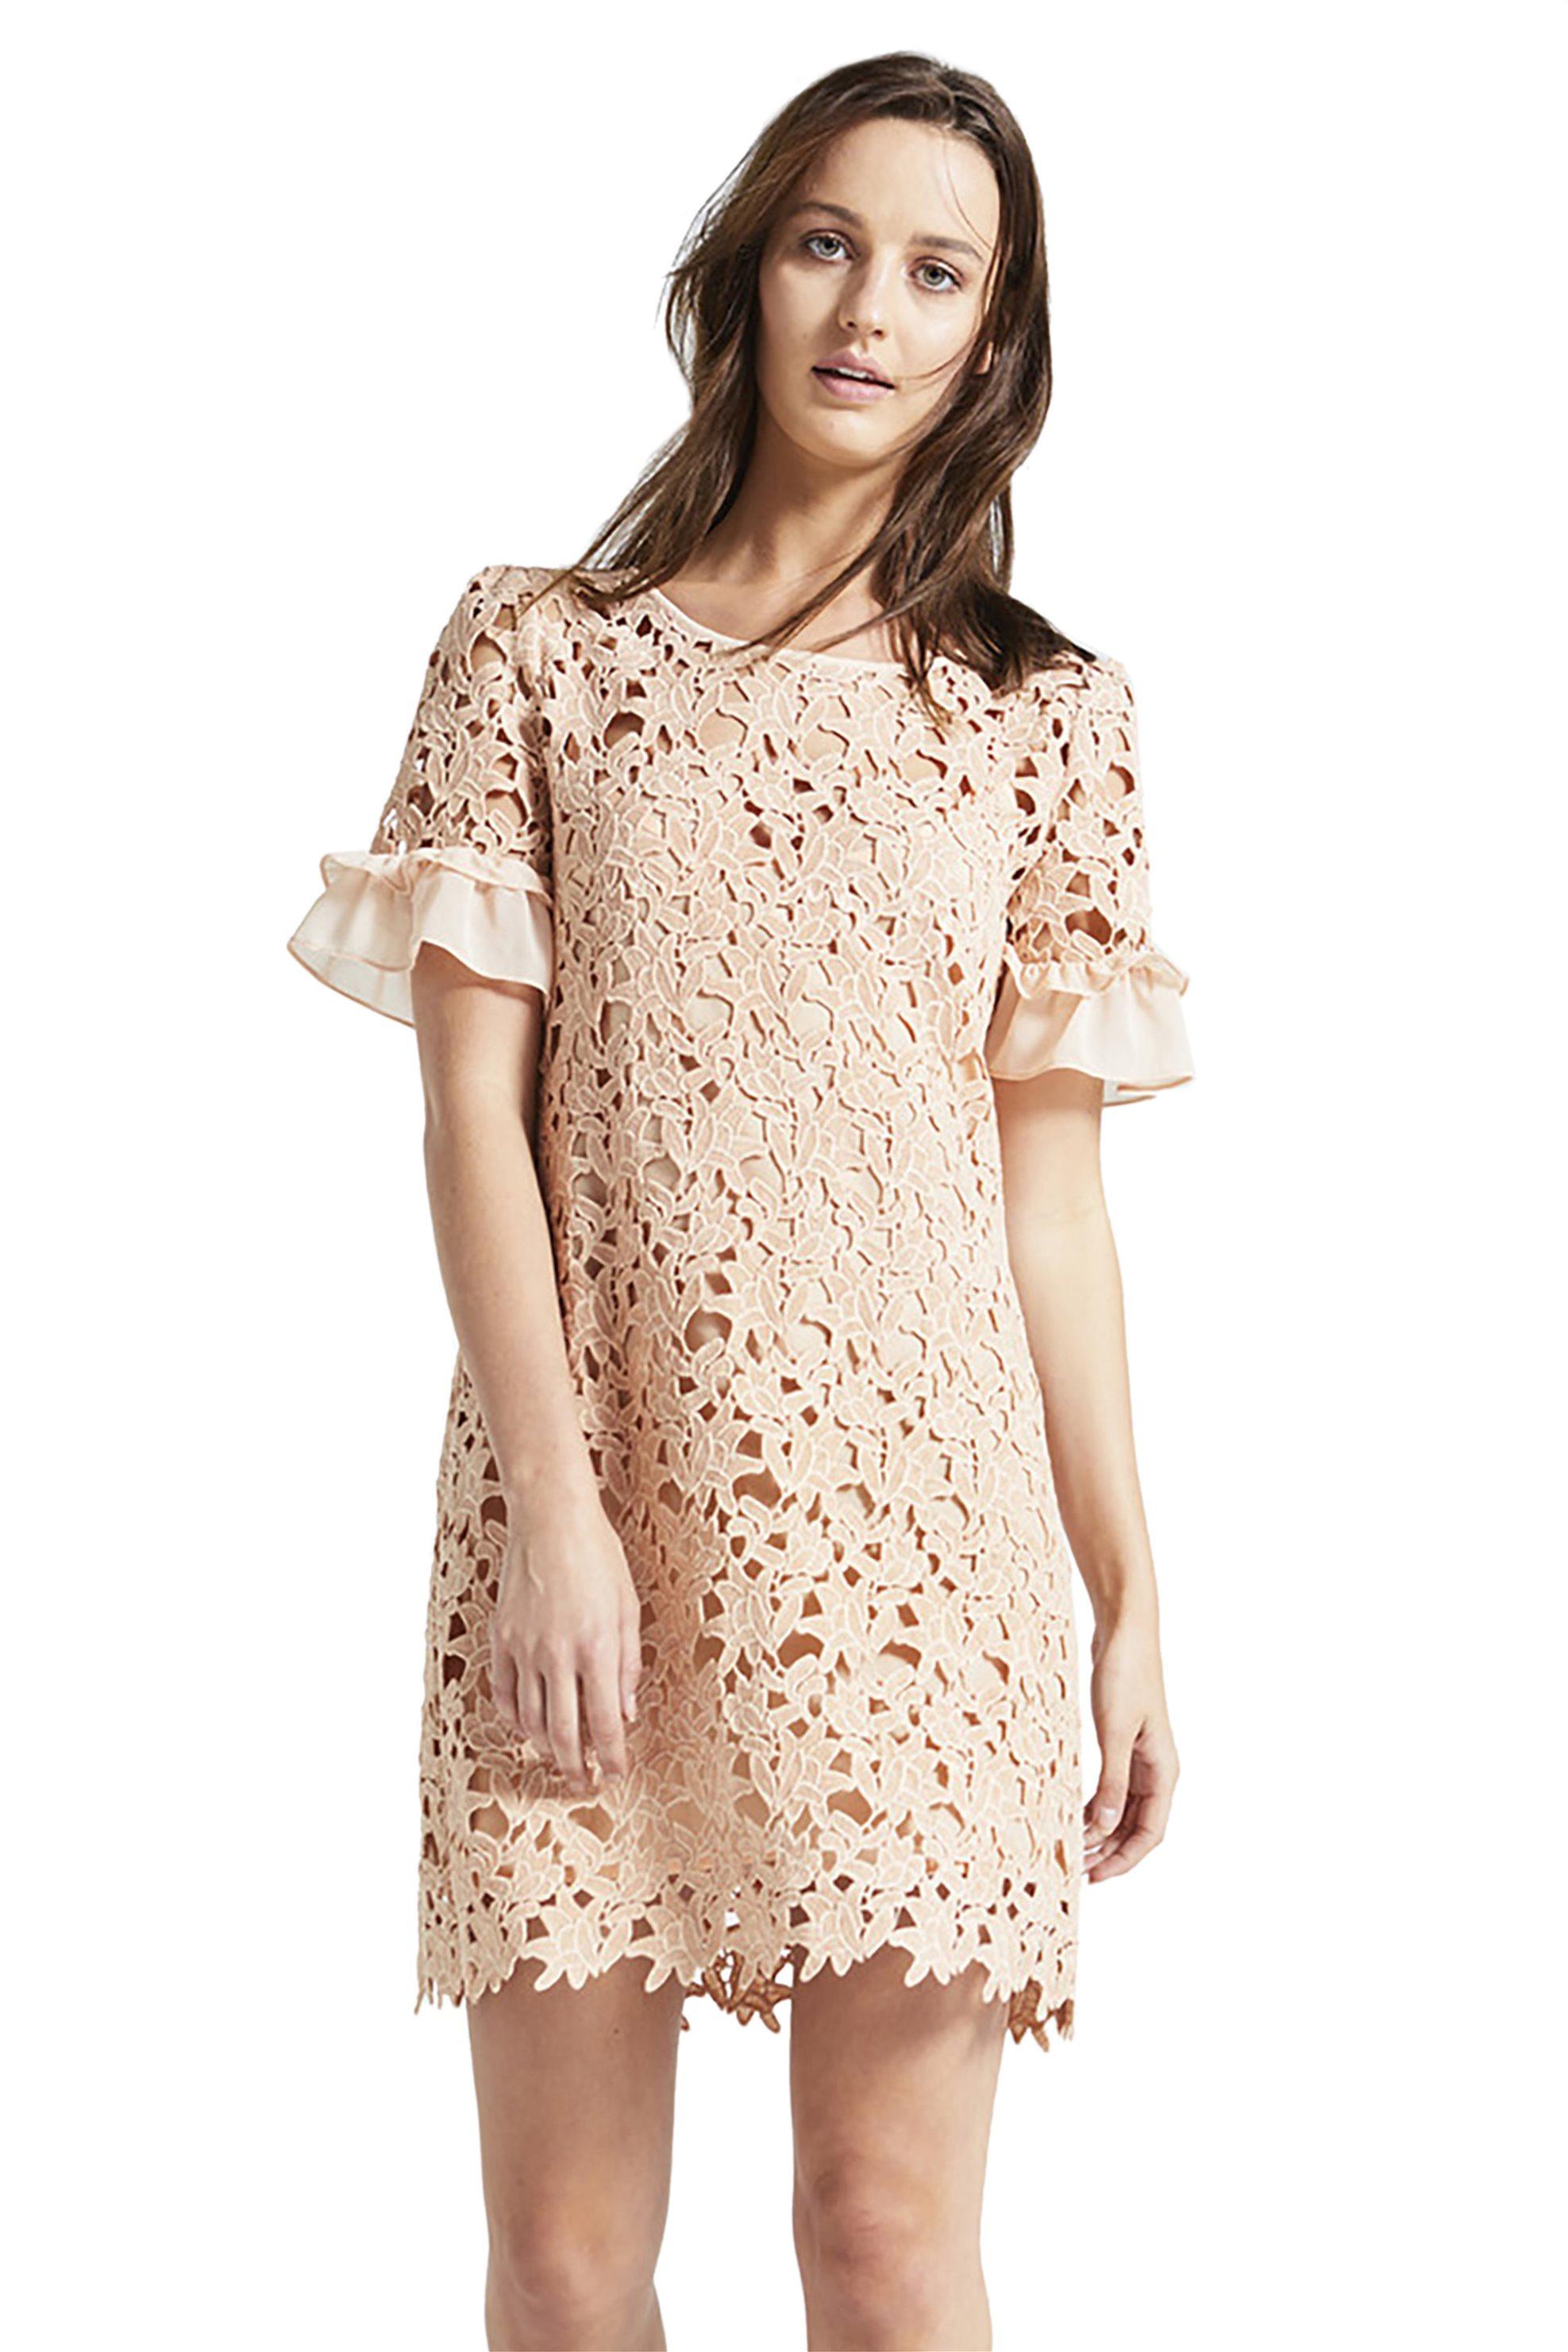 7a81f5f28075 Γυναικεία   Ρούχα   Φορέματα   Καθημερινά   9215 RO Μάξι σατέν ...